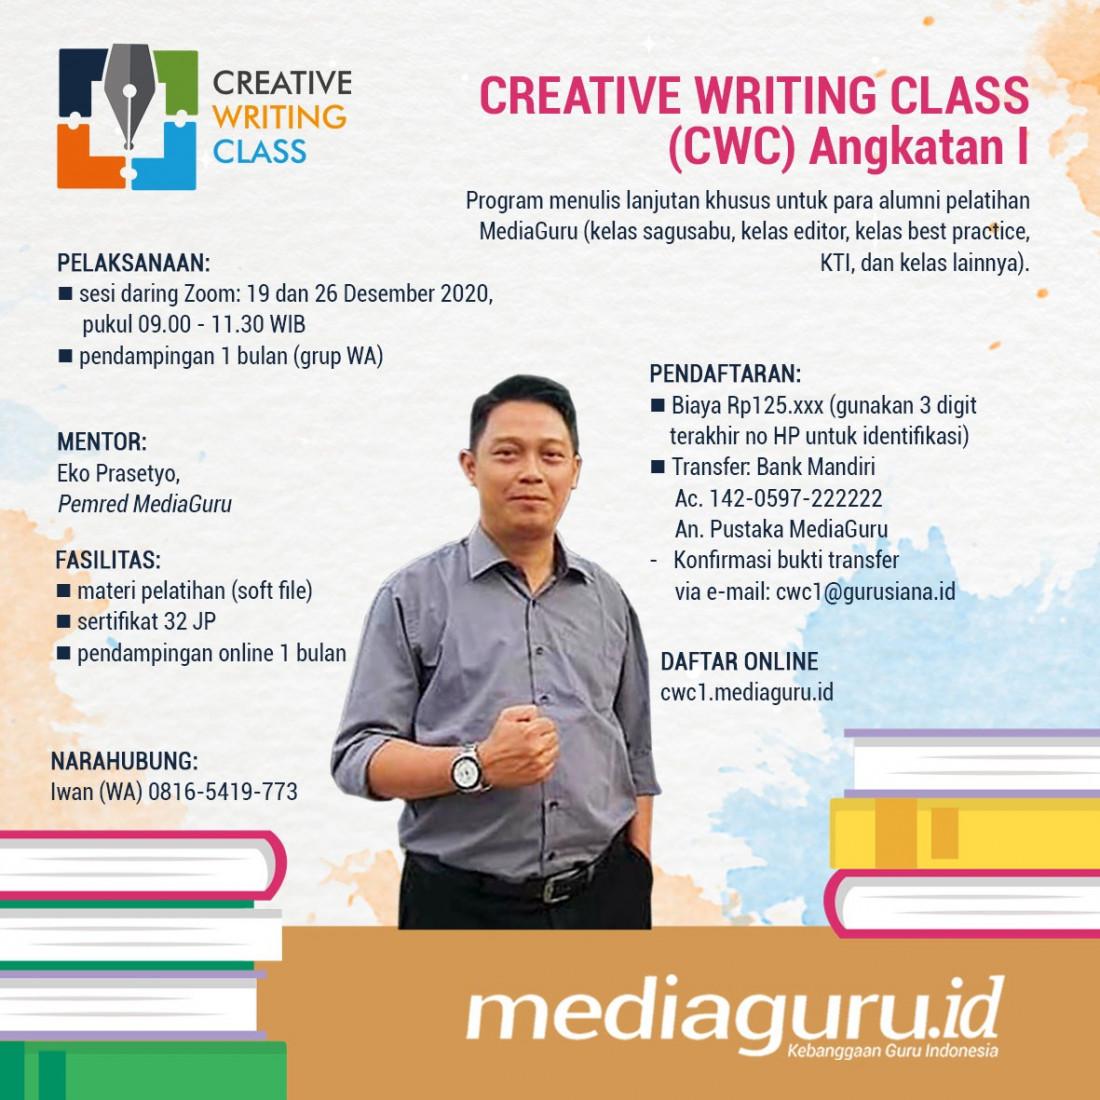 CREATIVE WRITING CLASS (CWC) I (19 & 26 DESEMBER 2020